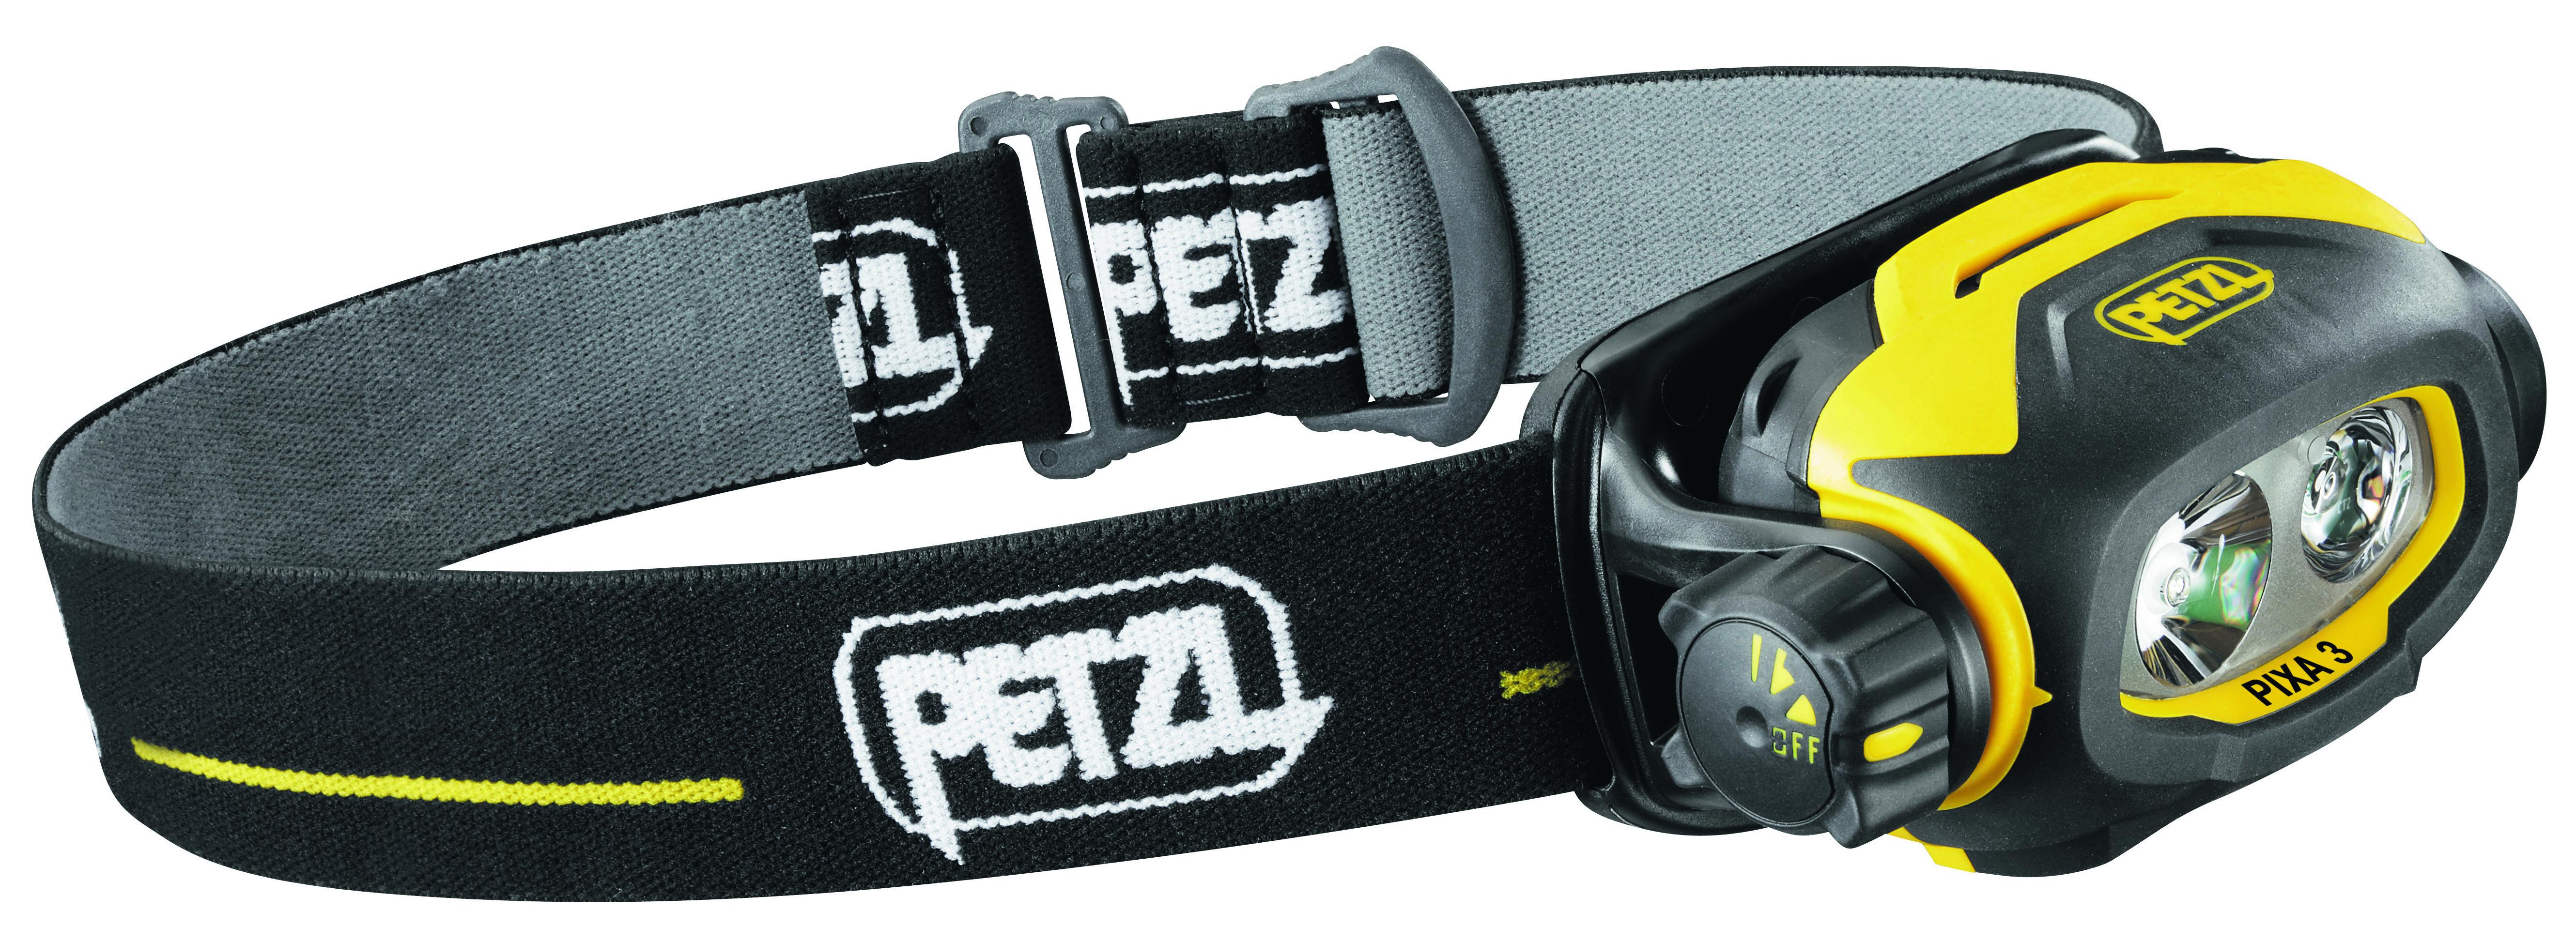 PIXA-3 Pro Headlamp PE-E78CHB